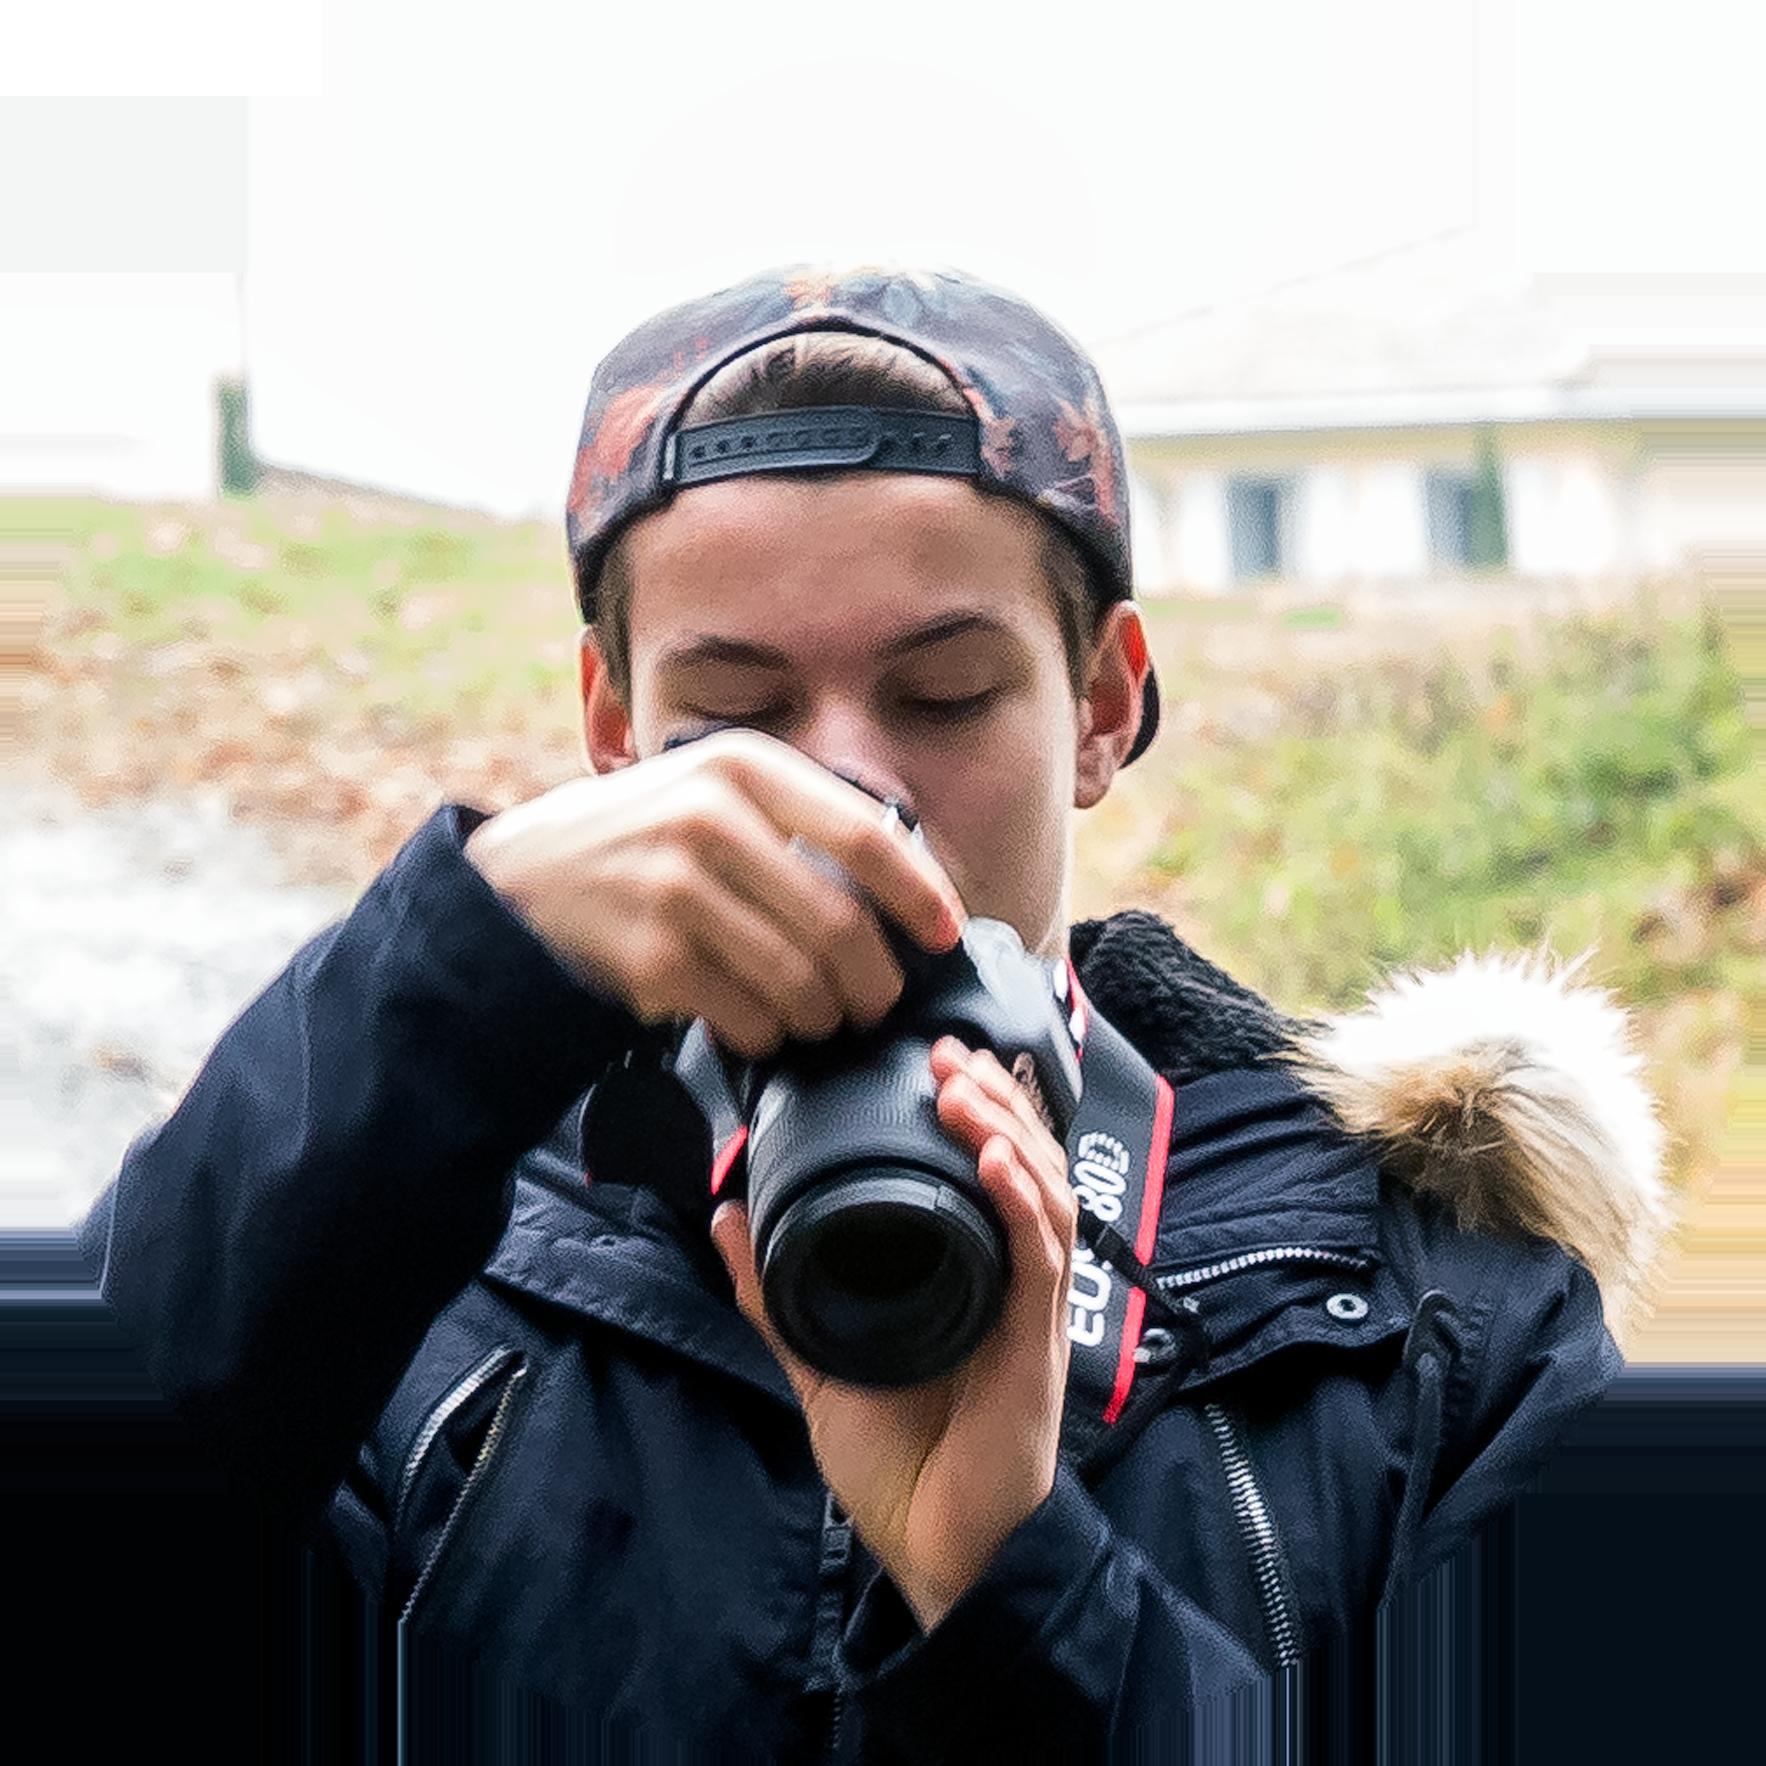 Fotokurs - Grundkurs Fotografie Kundenstimme